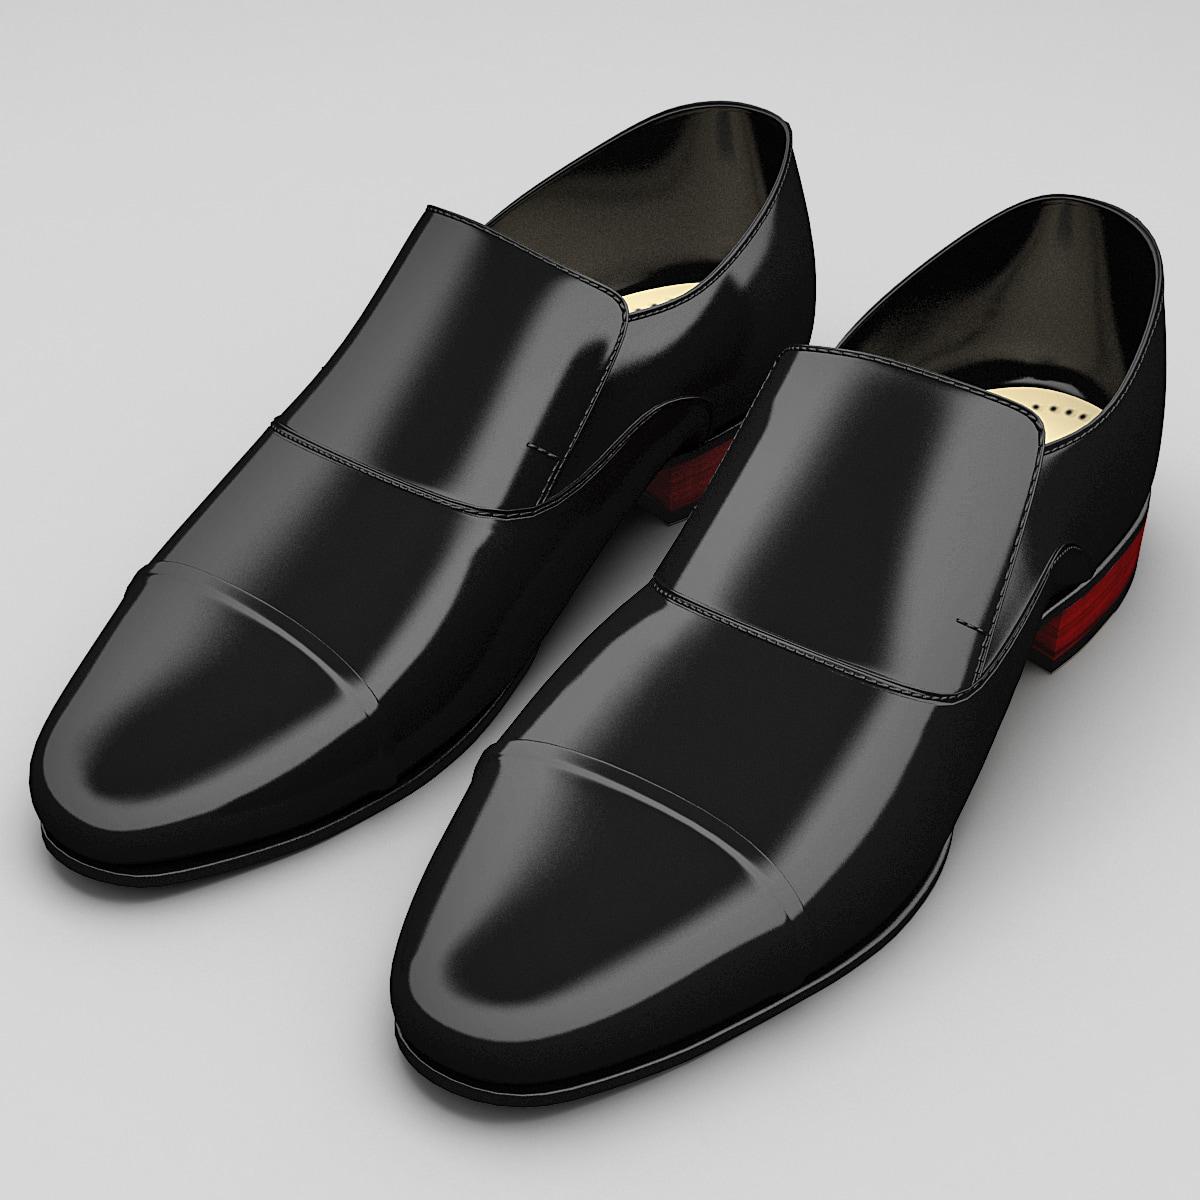 Mens_Shoes_Mooda_0001.jpg